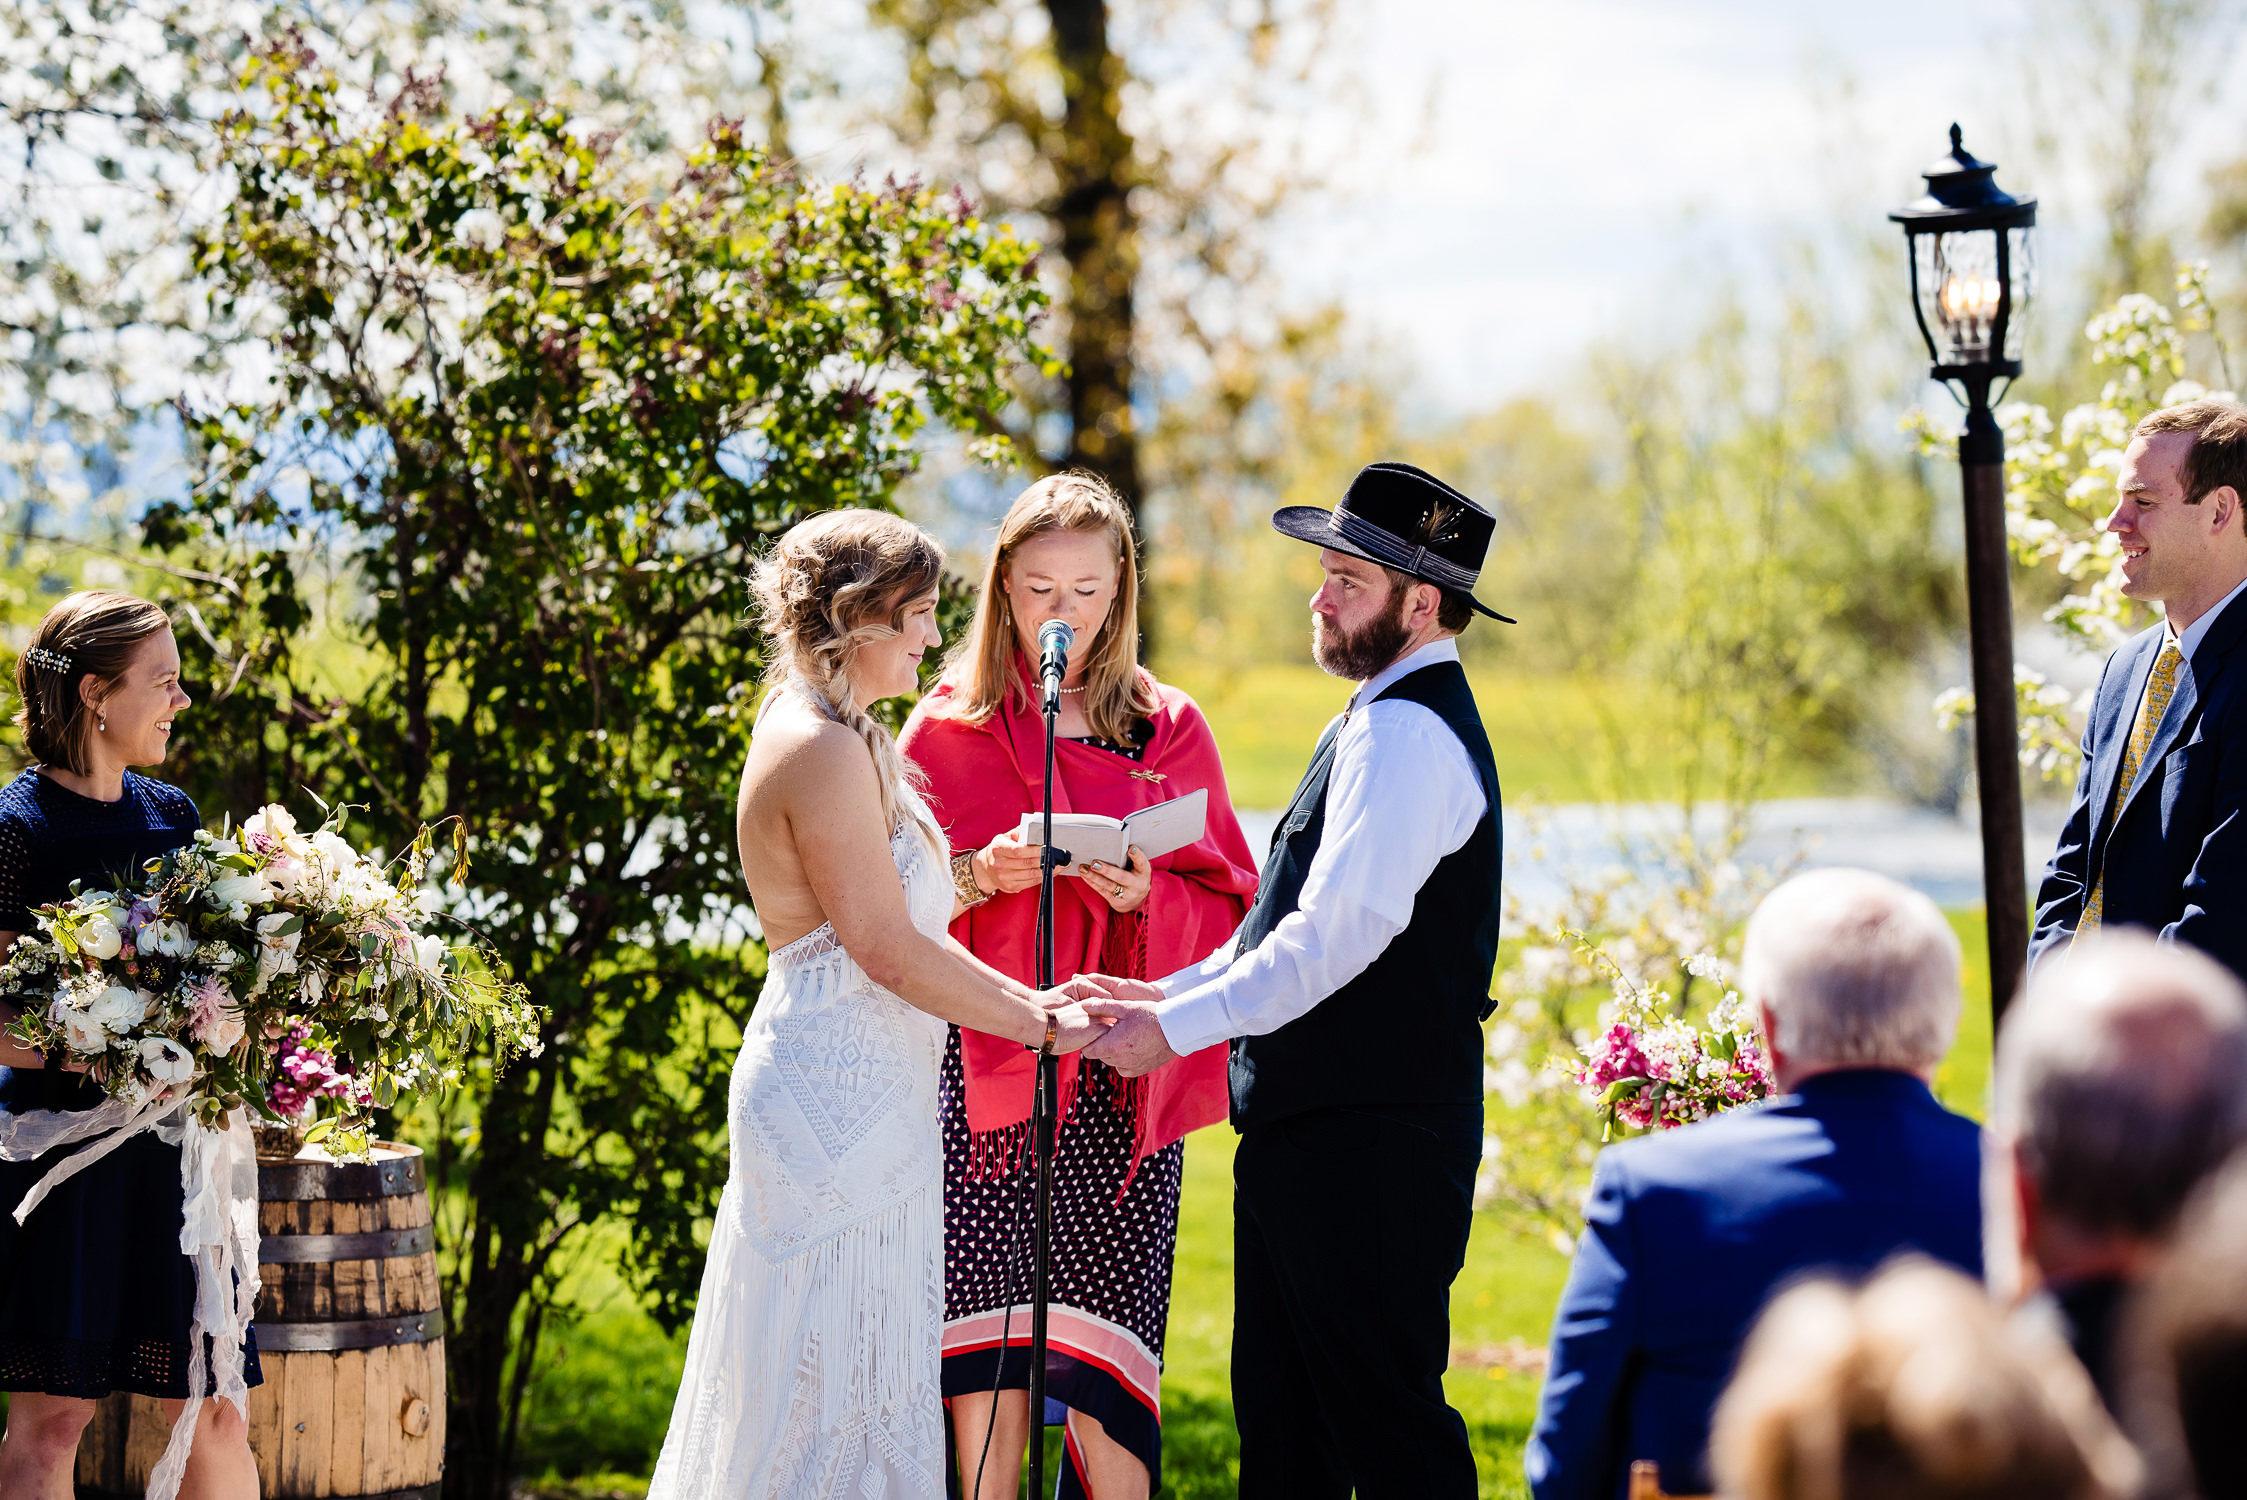 tourterelle-vermont-wedding-photographers-015-2-2247x1500.jpg